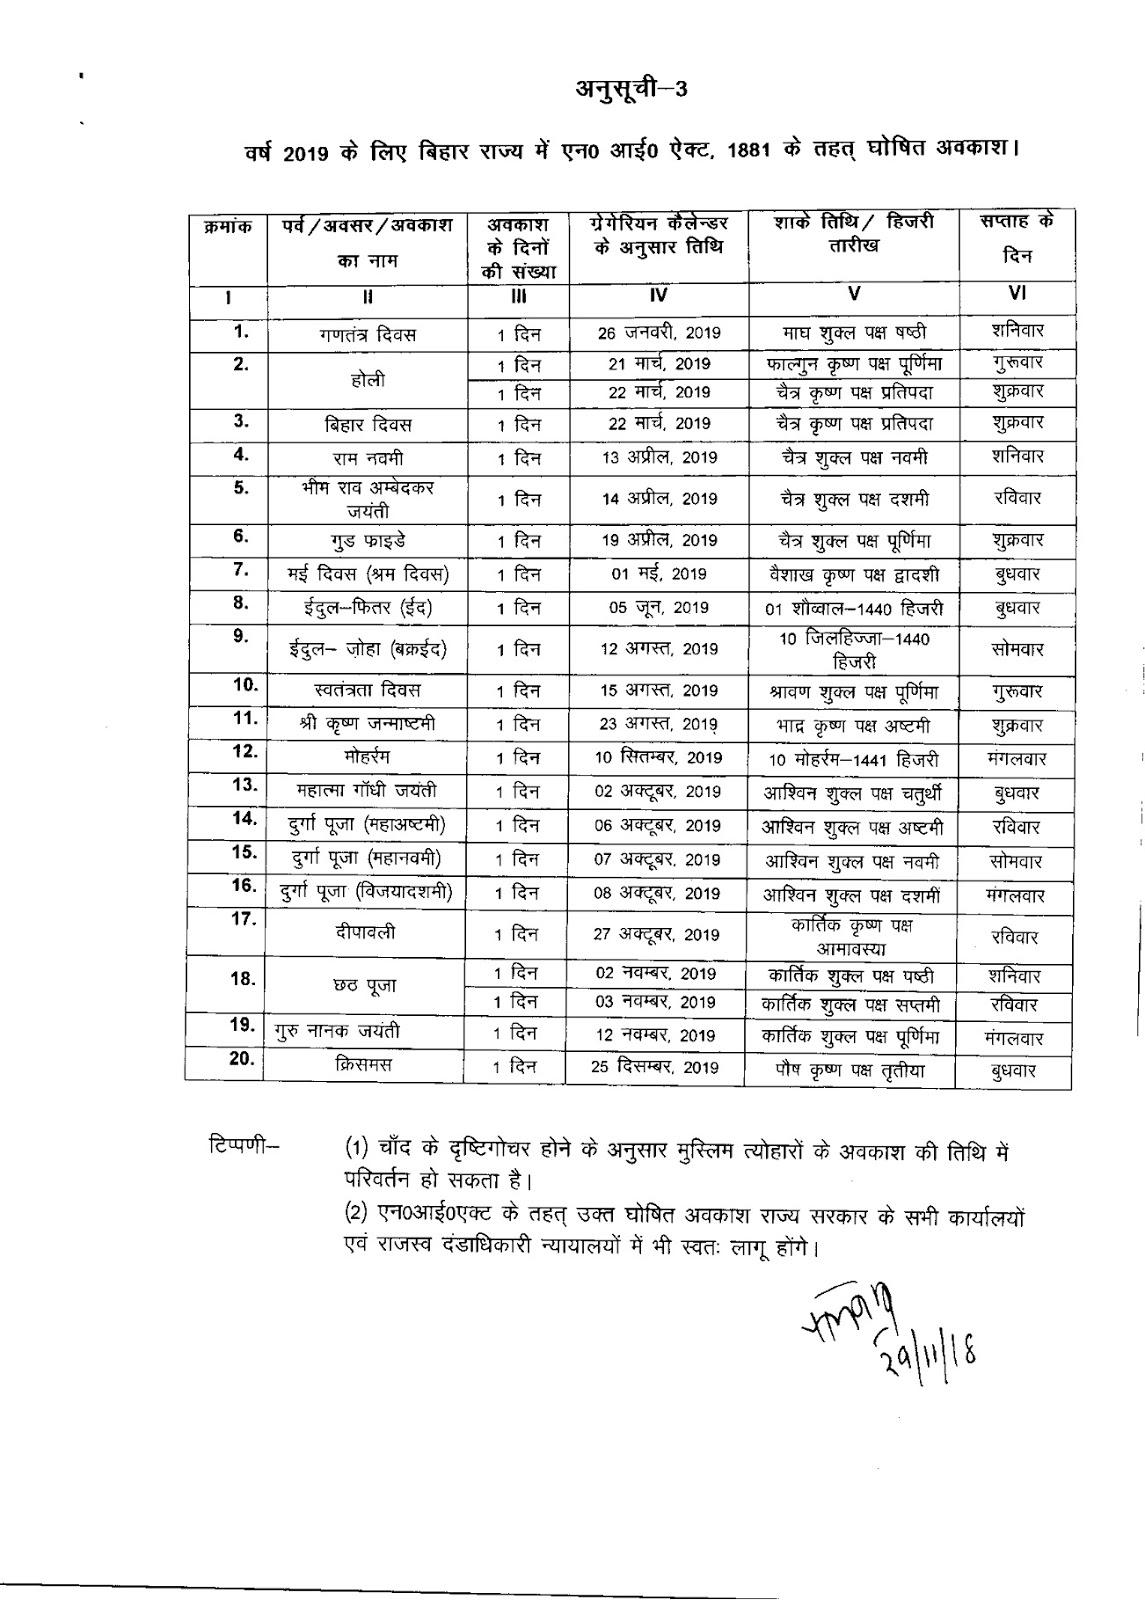 Bihar Government Calendar 2019 #educratsweb within Bihar Government Calendar 2020